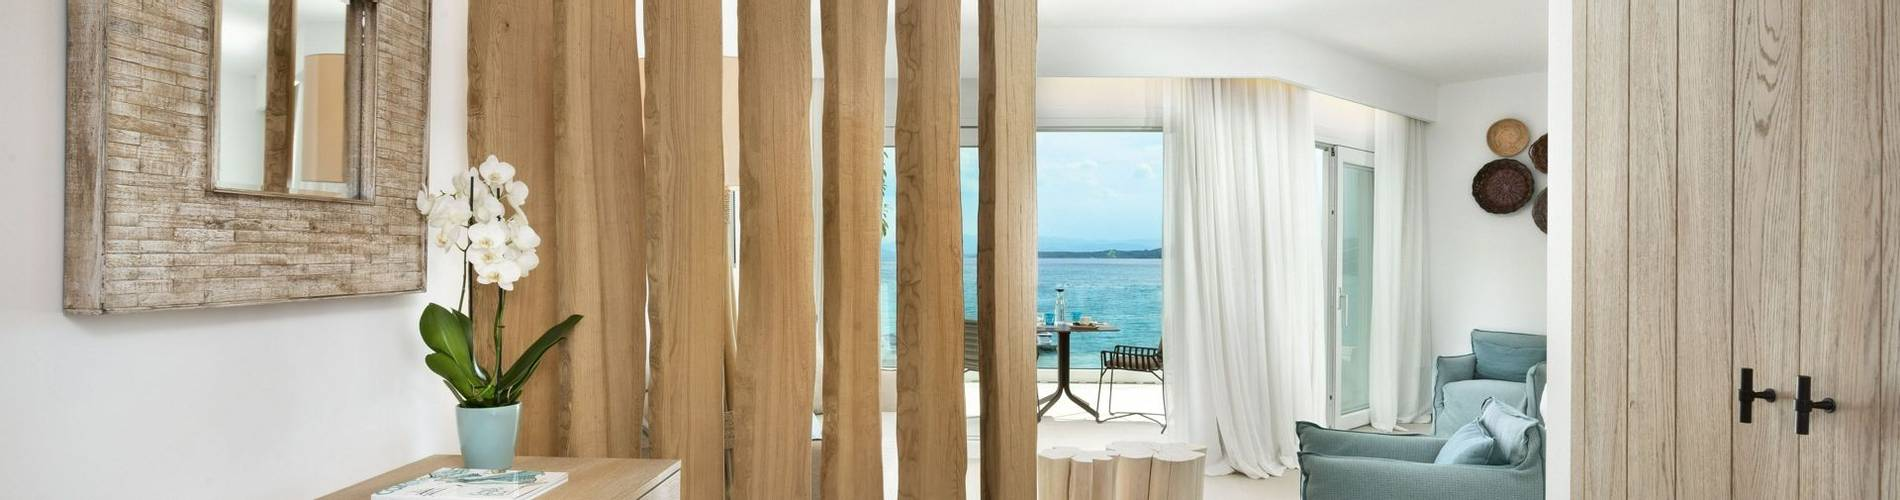 Pool Suite - Gabbiano Azzurro Hotel Sardinia8.jpg